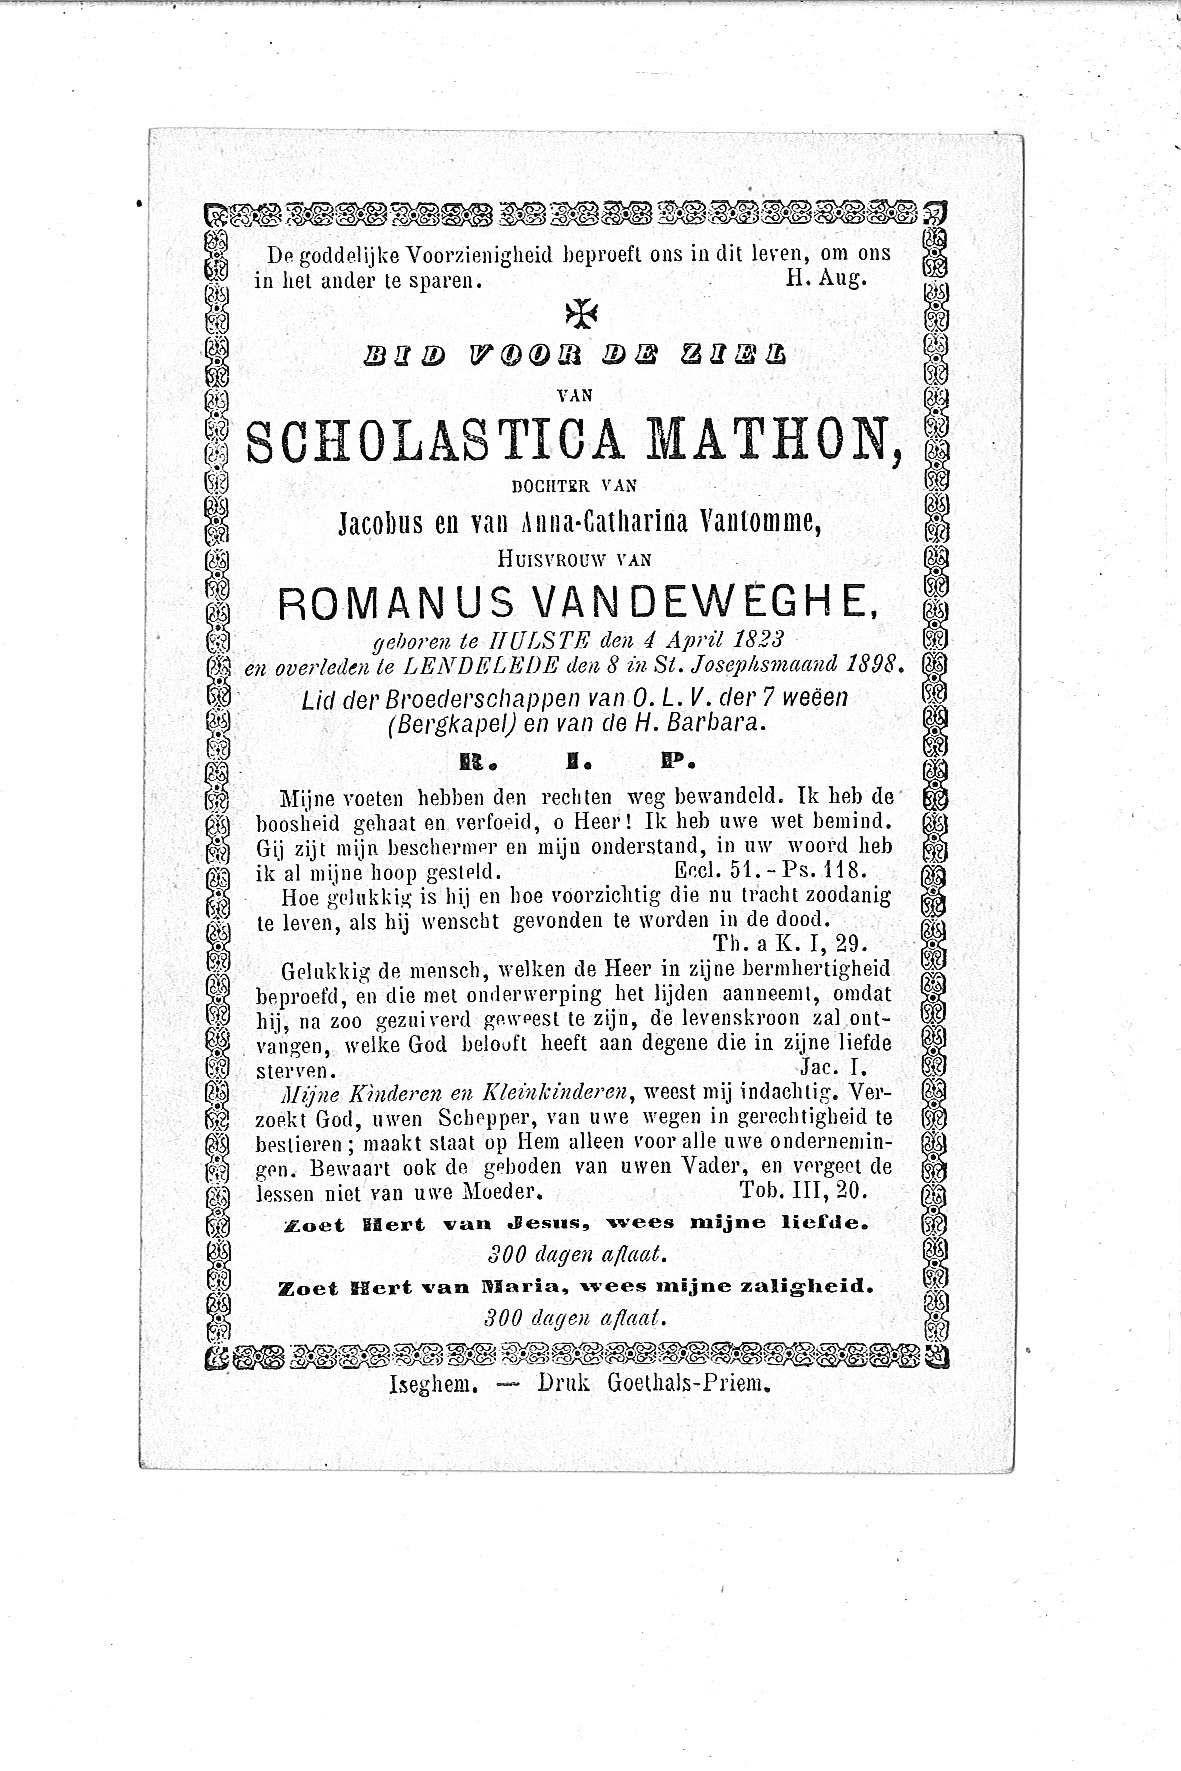 Scholastica(1898)20100202164201_00003.jpg